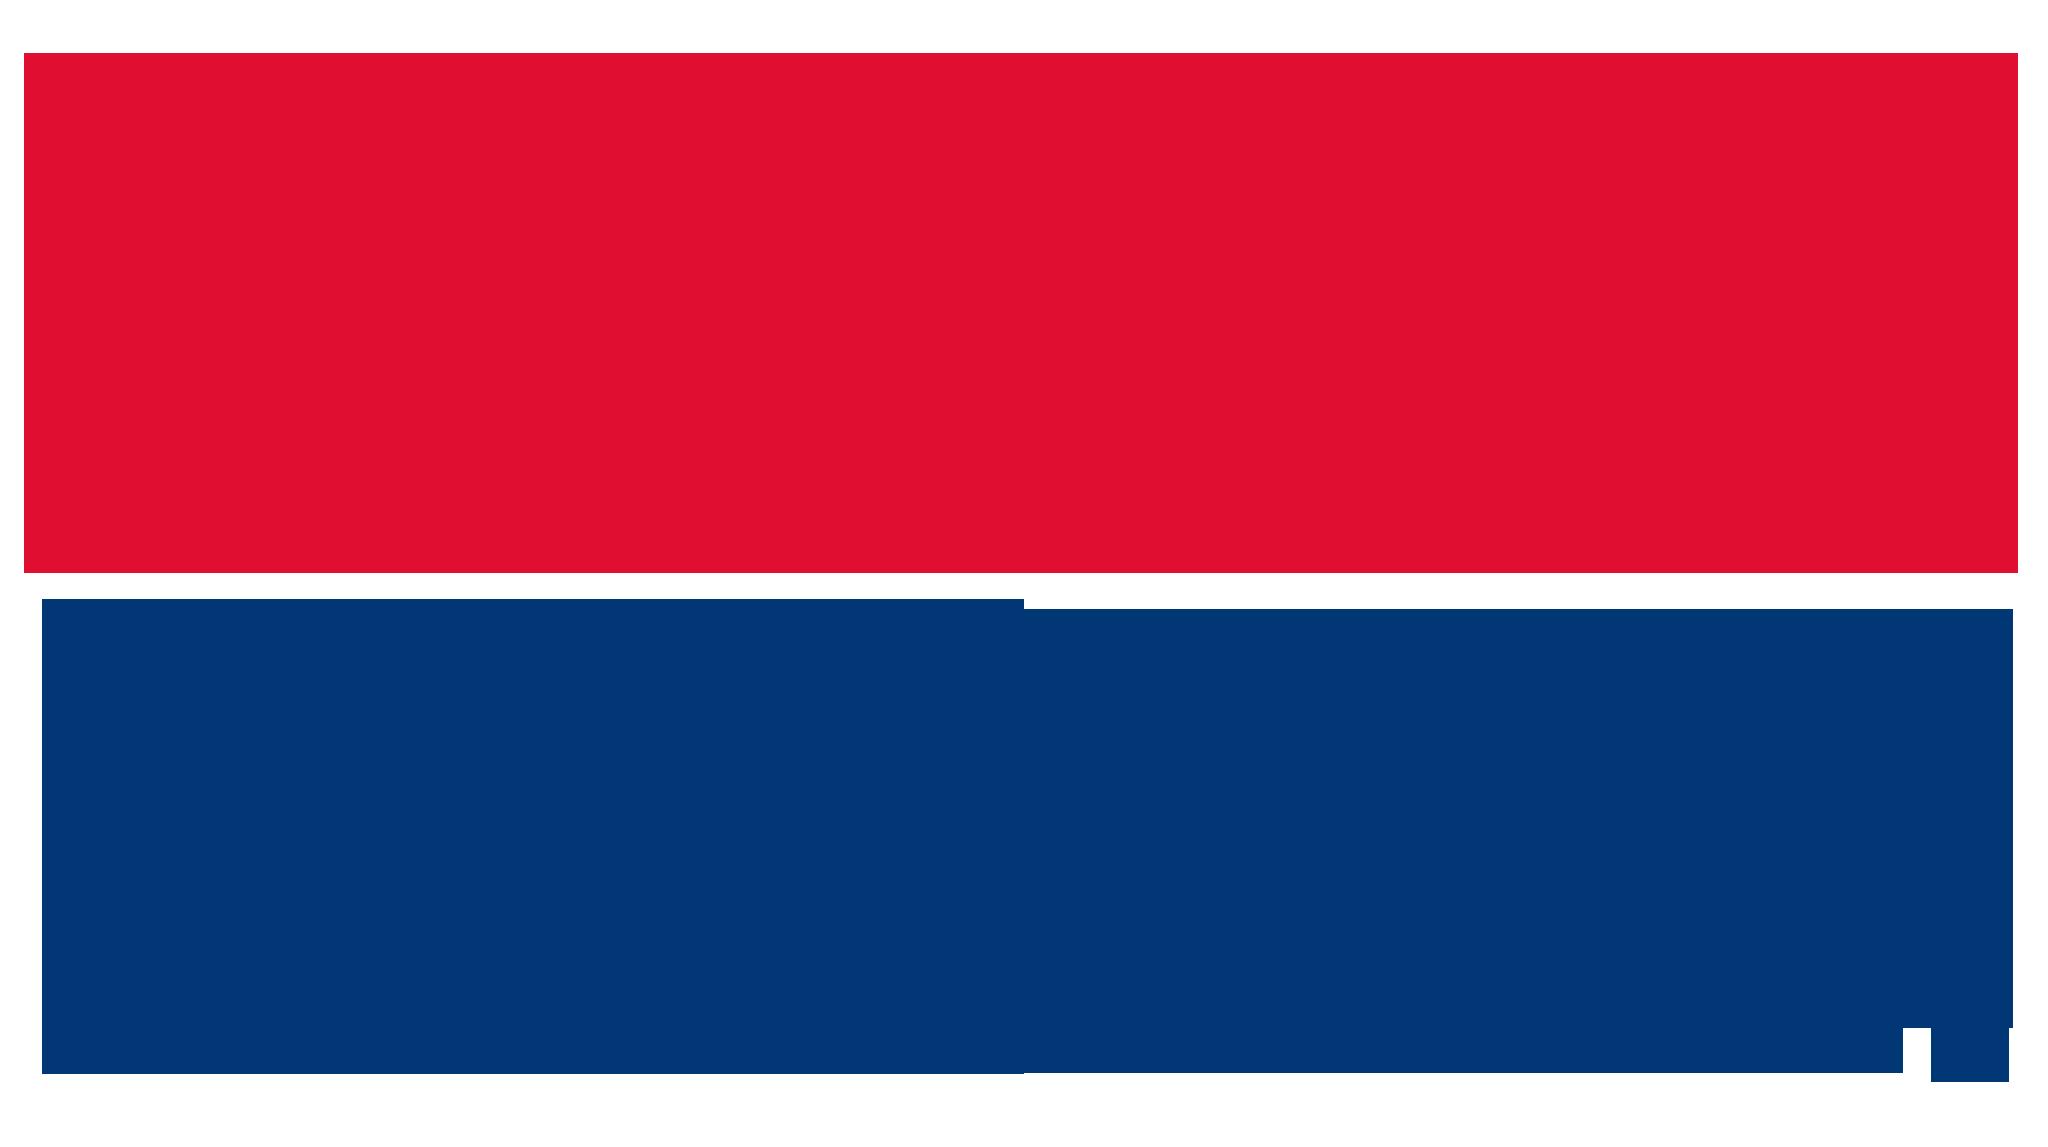 Buy Buy Baby Logo Vector